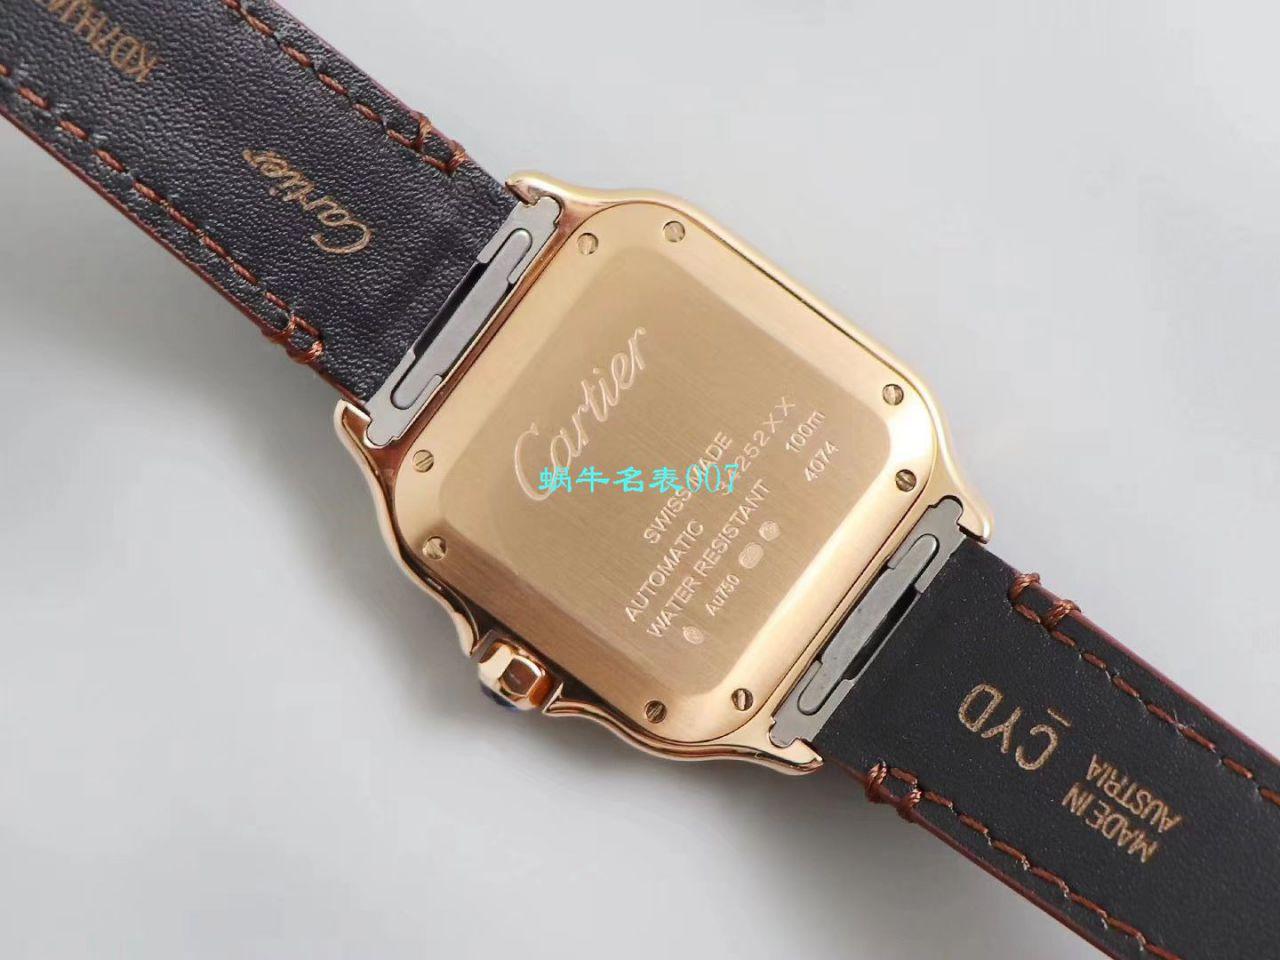 【V6厂超A高仿手表】卡地亚山度士系列WGSA0012(中号)腕表